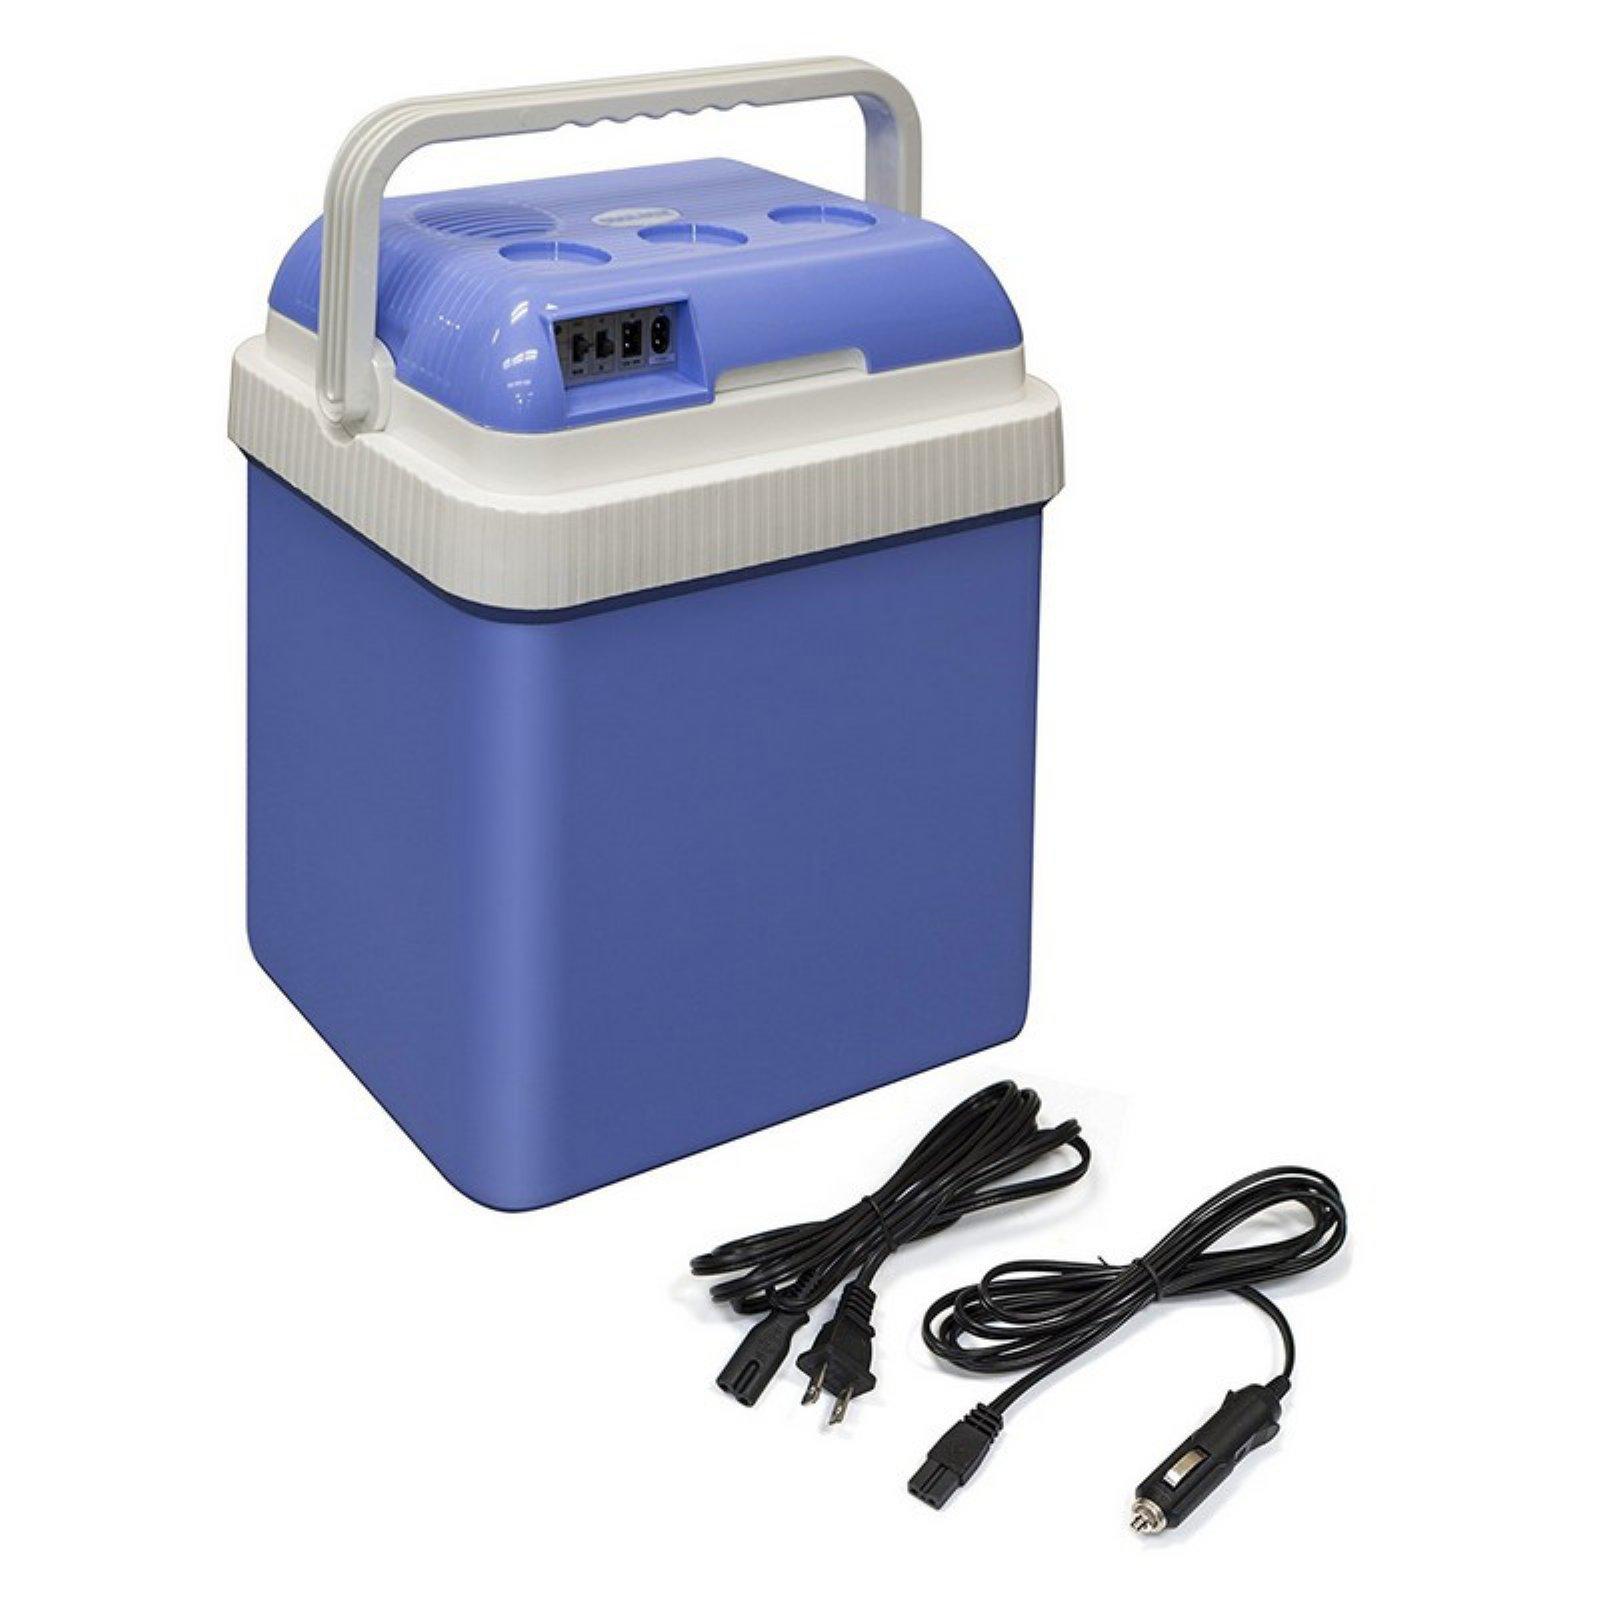 ALEKO CARFR24BL Portable Car Fridge Travel Cooler Warmer 12V 24 Liter Capacity, Light Blue Color